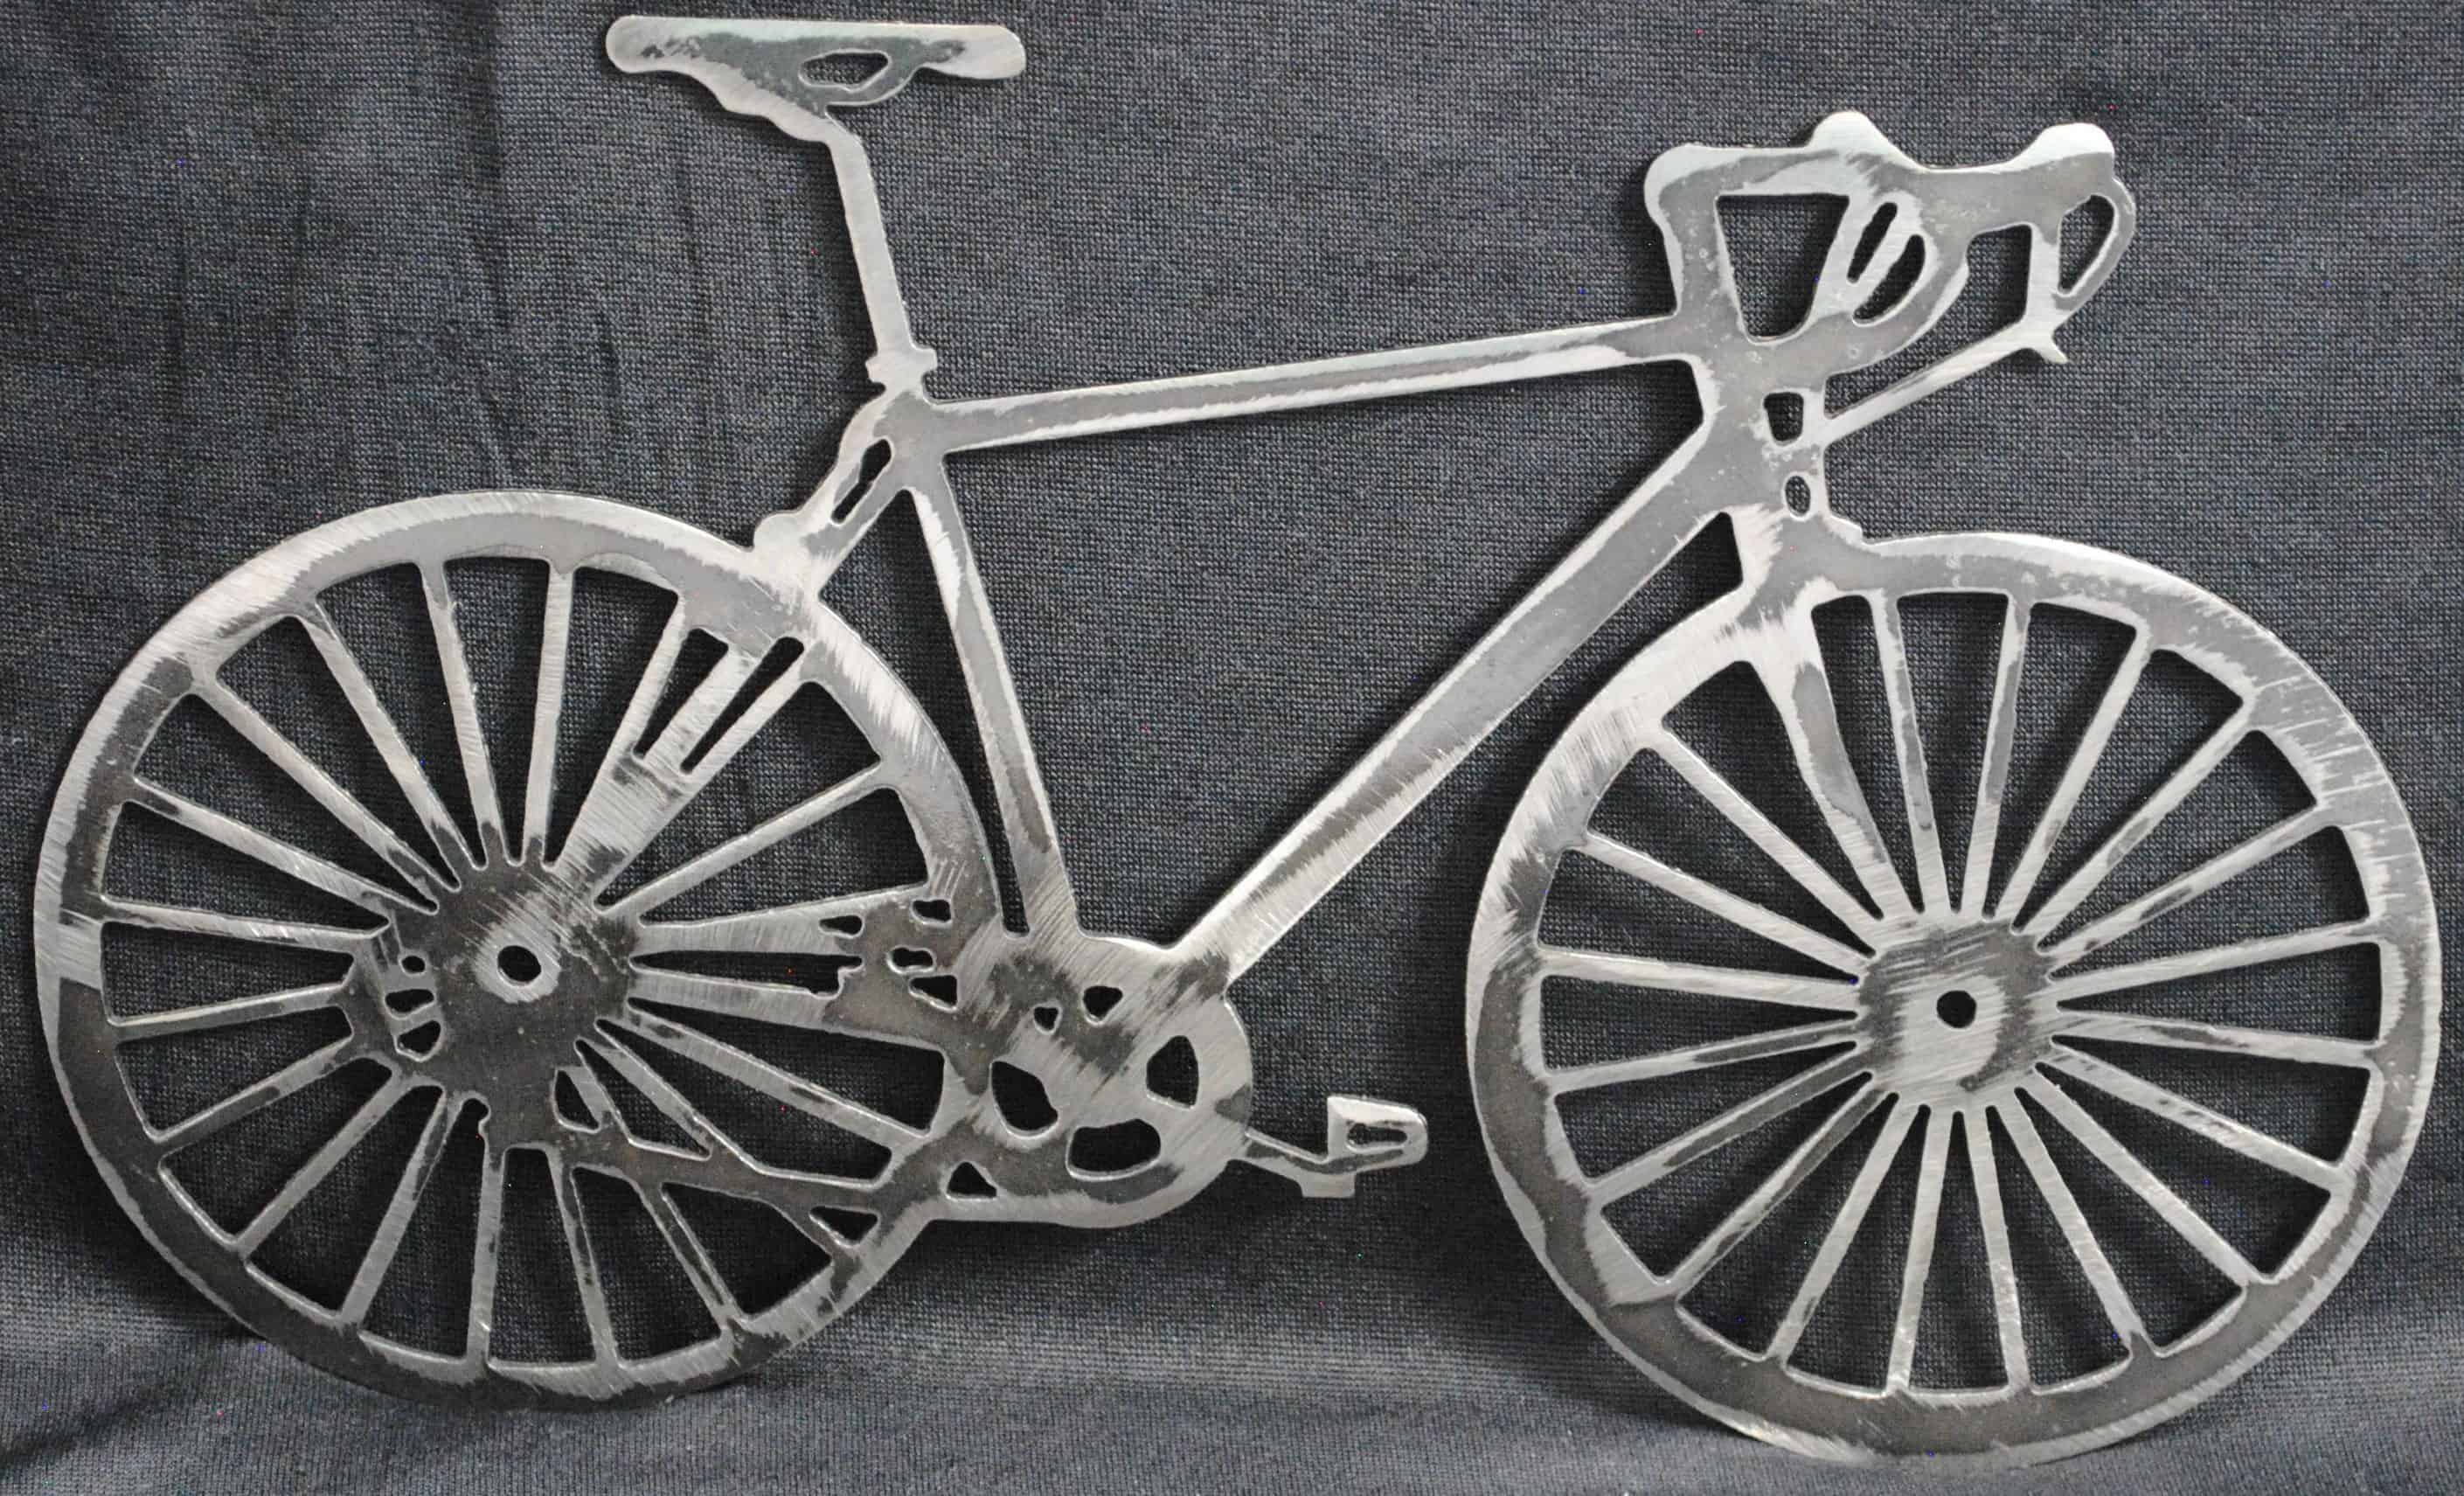 Metal Bicycle Wall Art – Metal Art Colorado In Favorite Metal Bicycle Wall Decor (View 11 of 20)